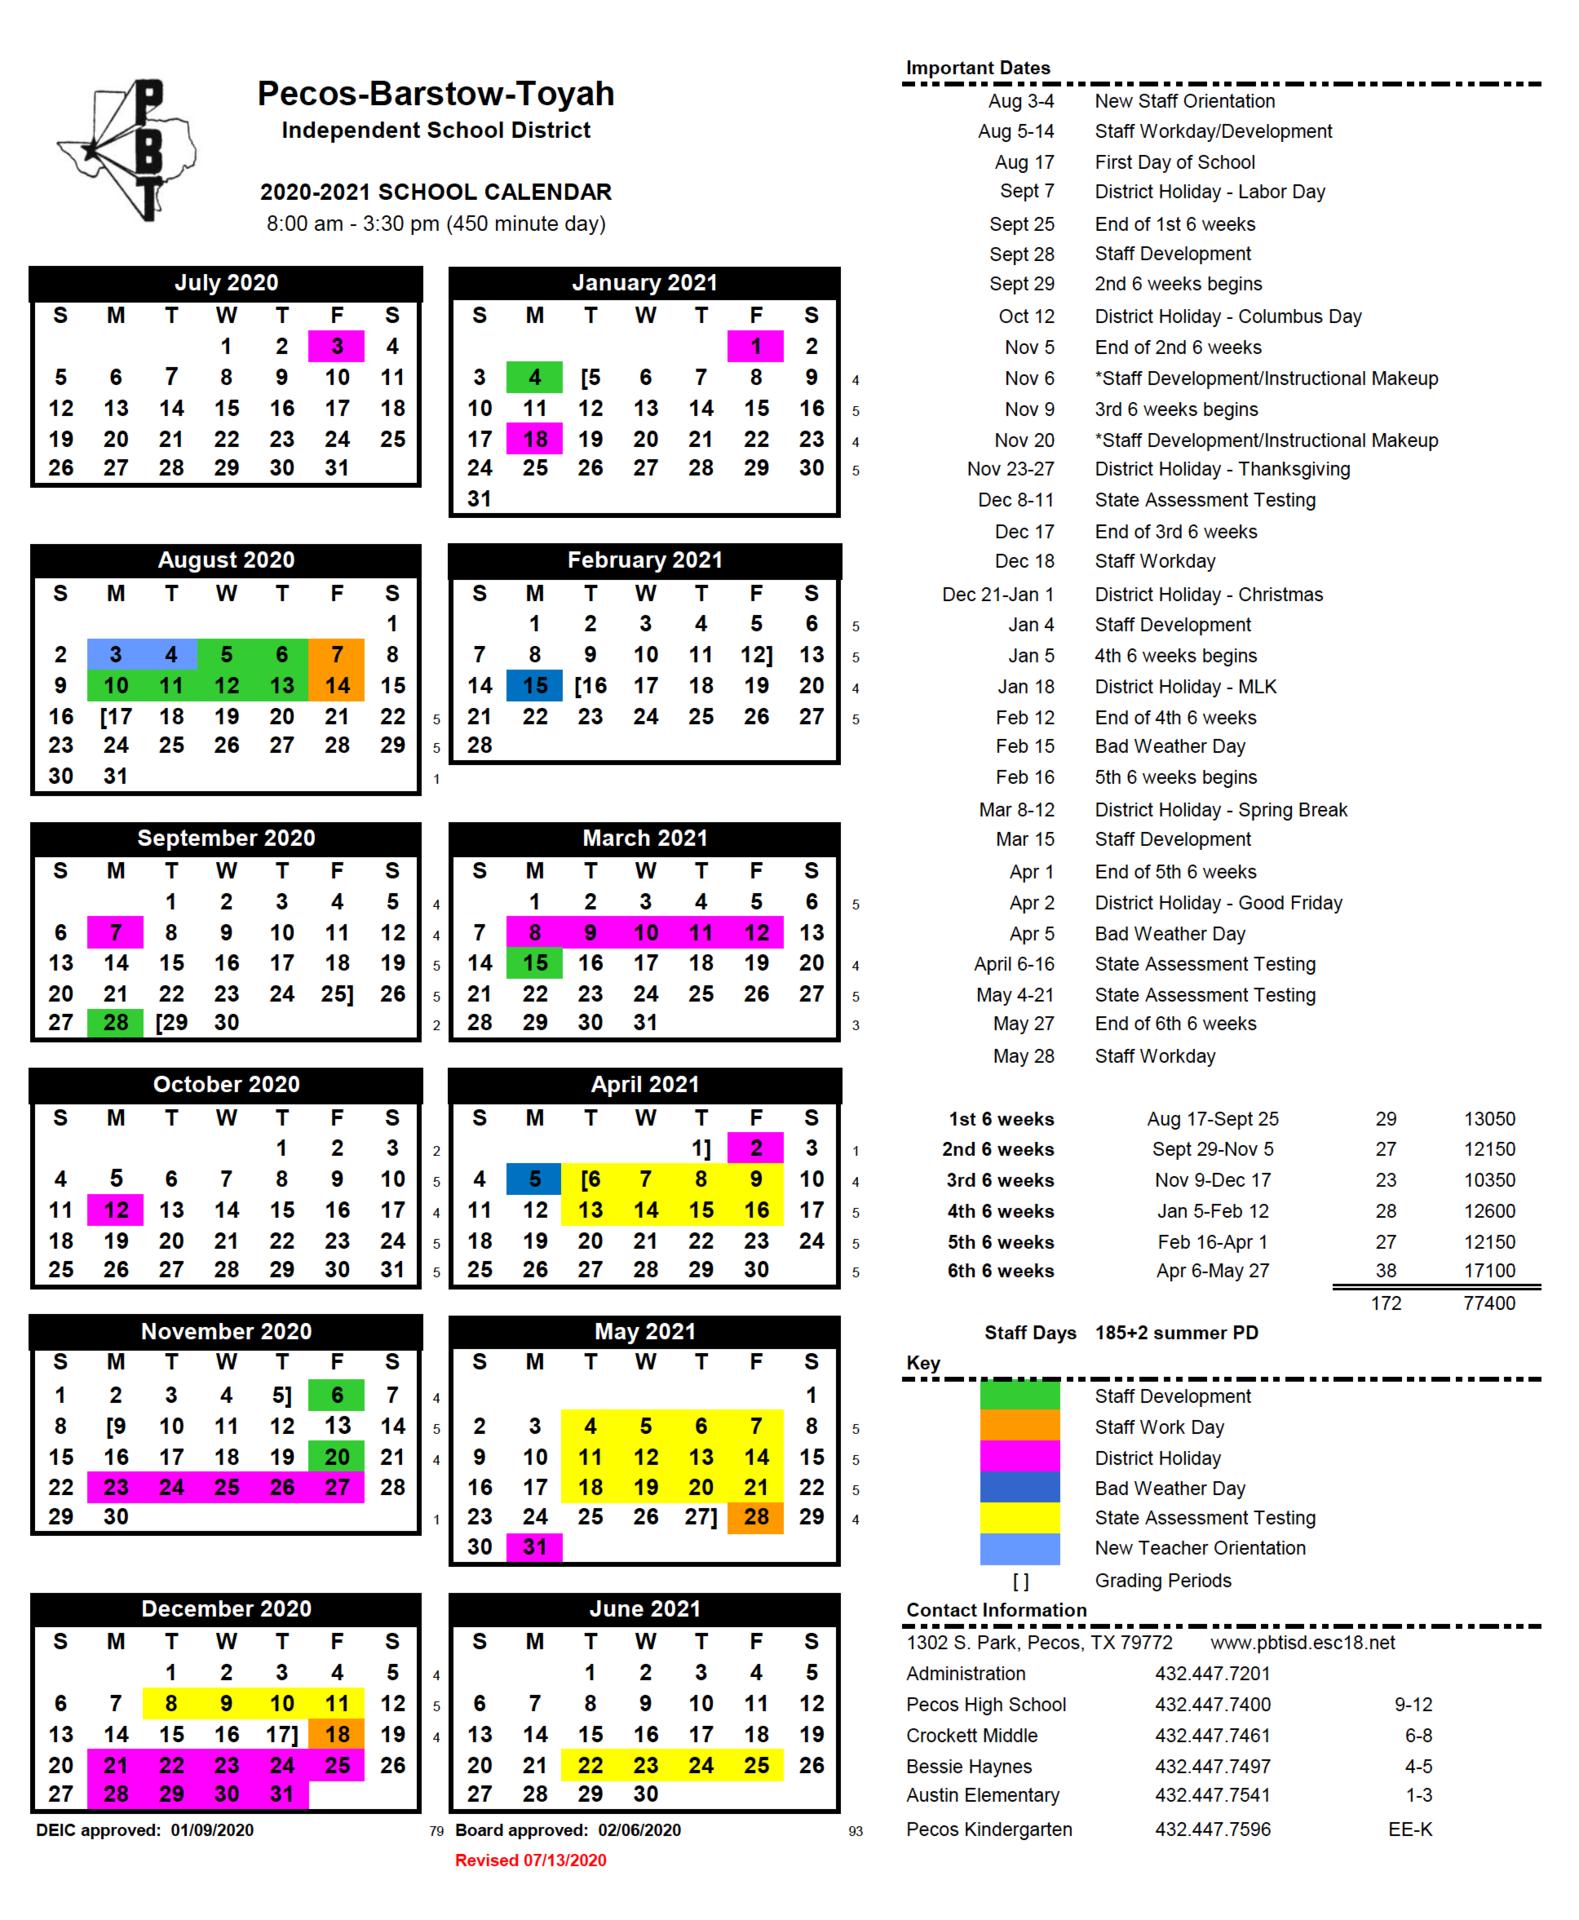 School Calendar - Revised